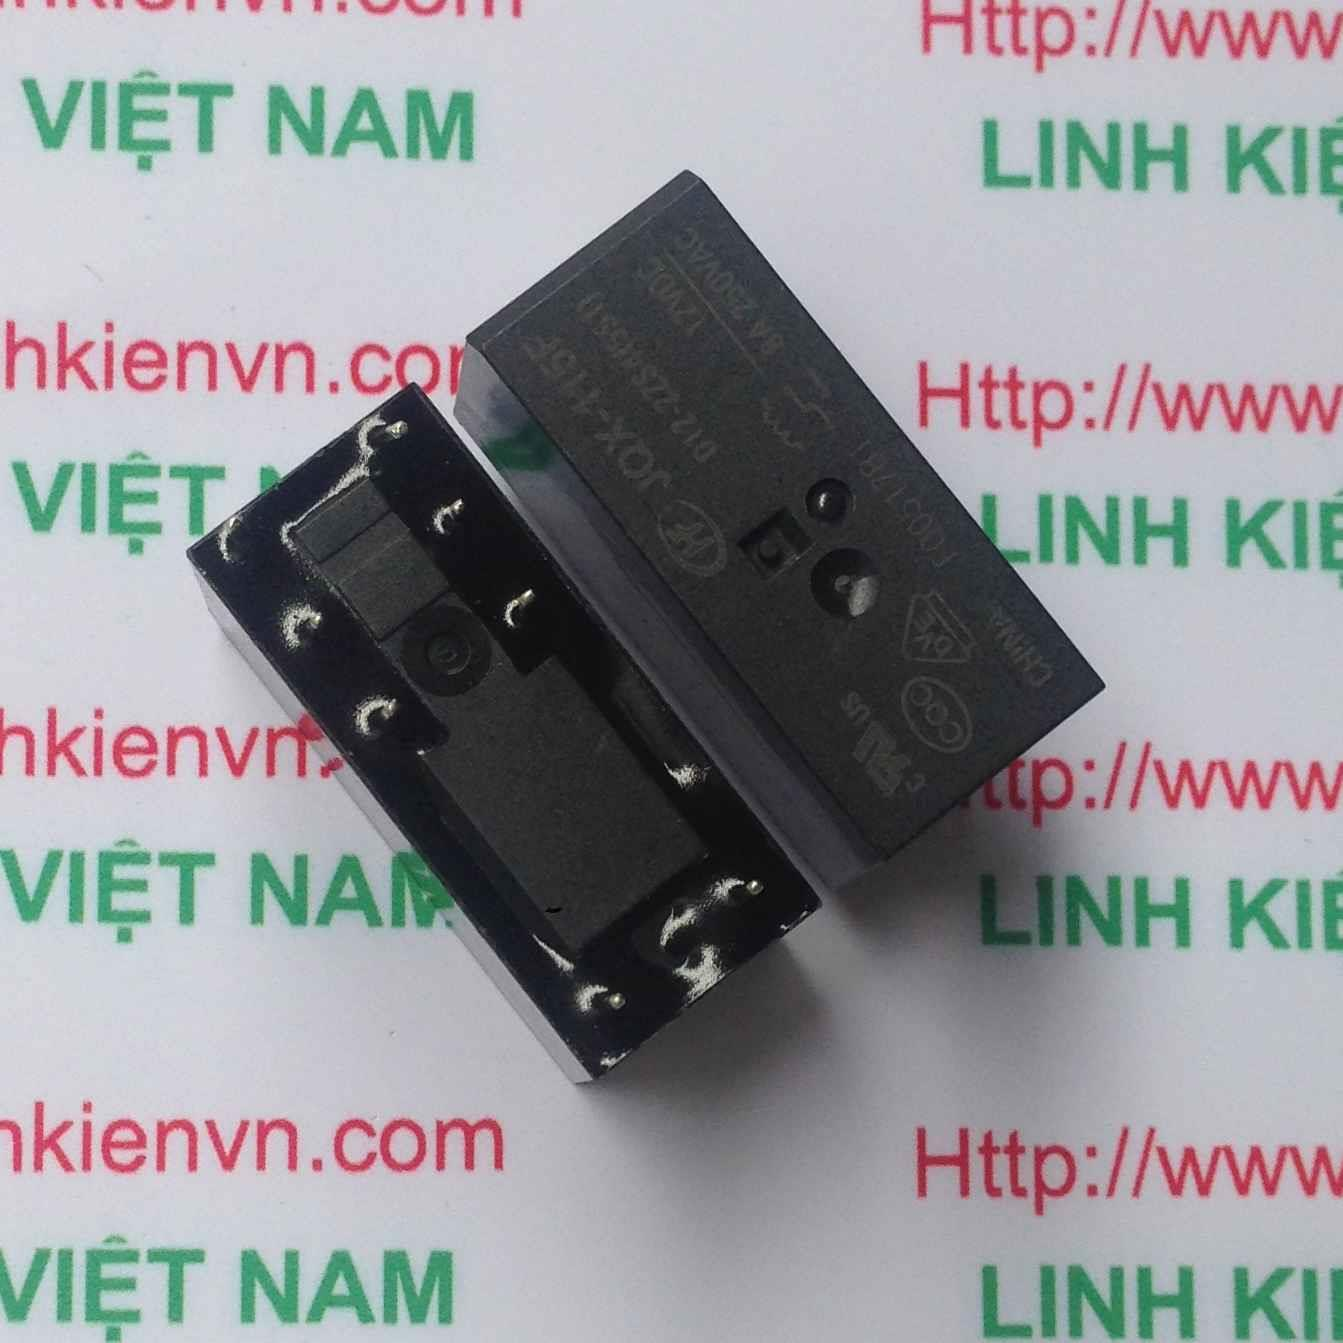 Relay 12V 8A-250VAC JQX-115F / Relay 8A 12V - G3H1(KB4H3)